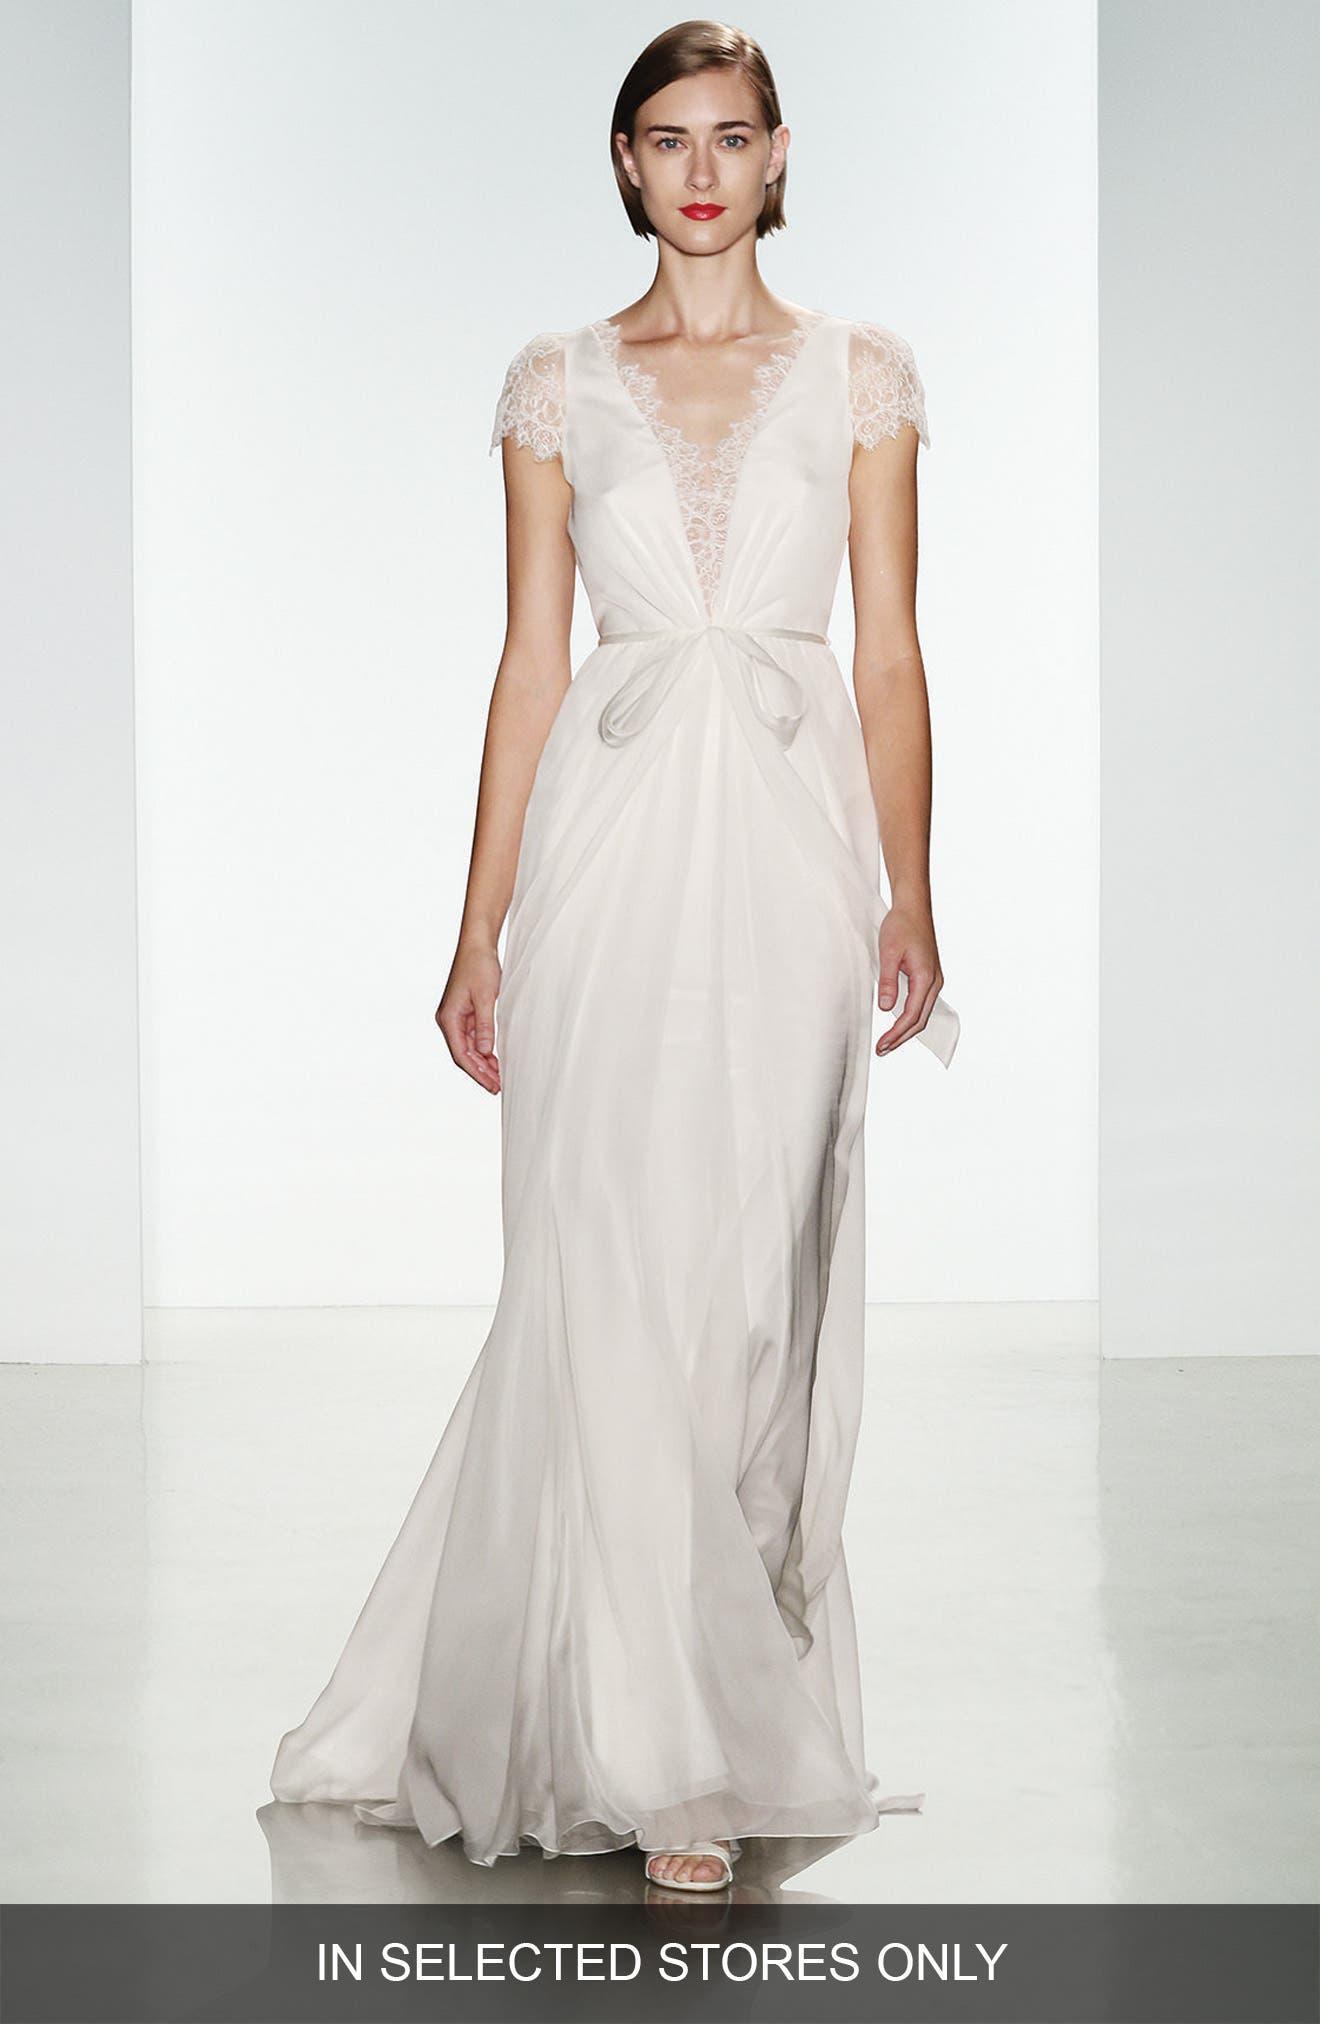 Lainee Silk Chiffon & Lace Cap Sleeve Gown,                             Alternate thumbnail 2, color,                             900